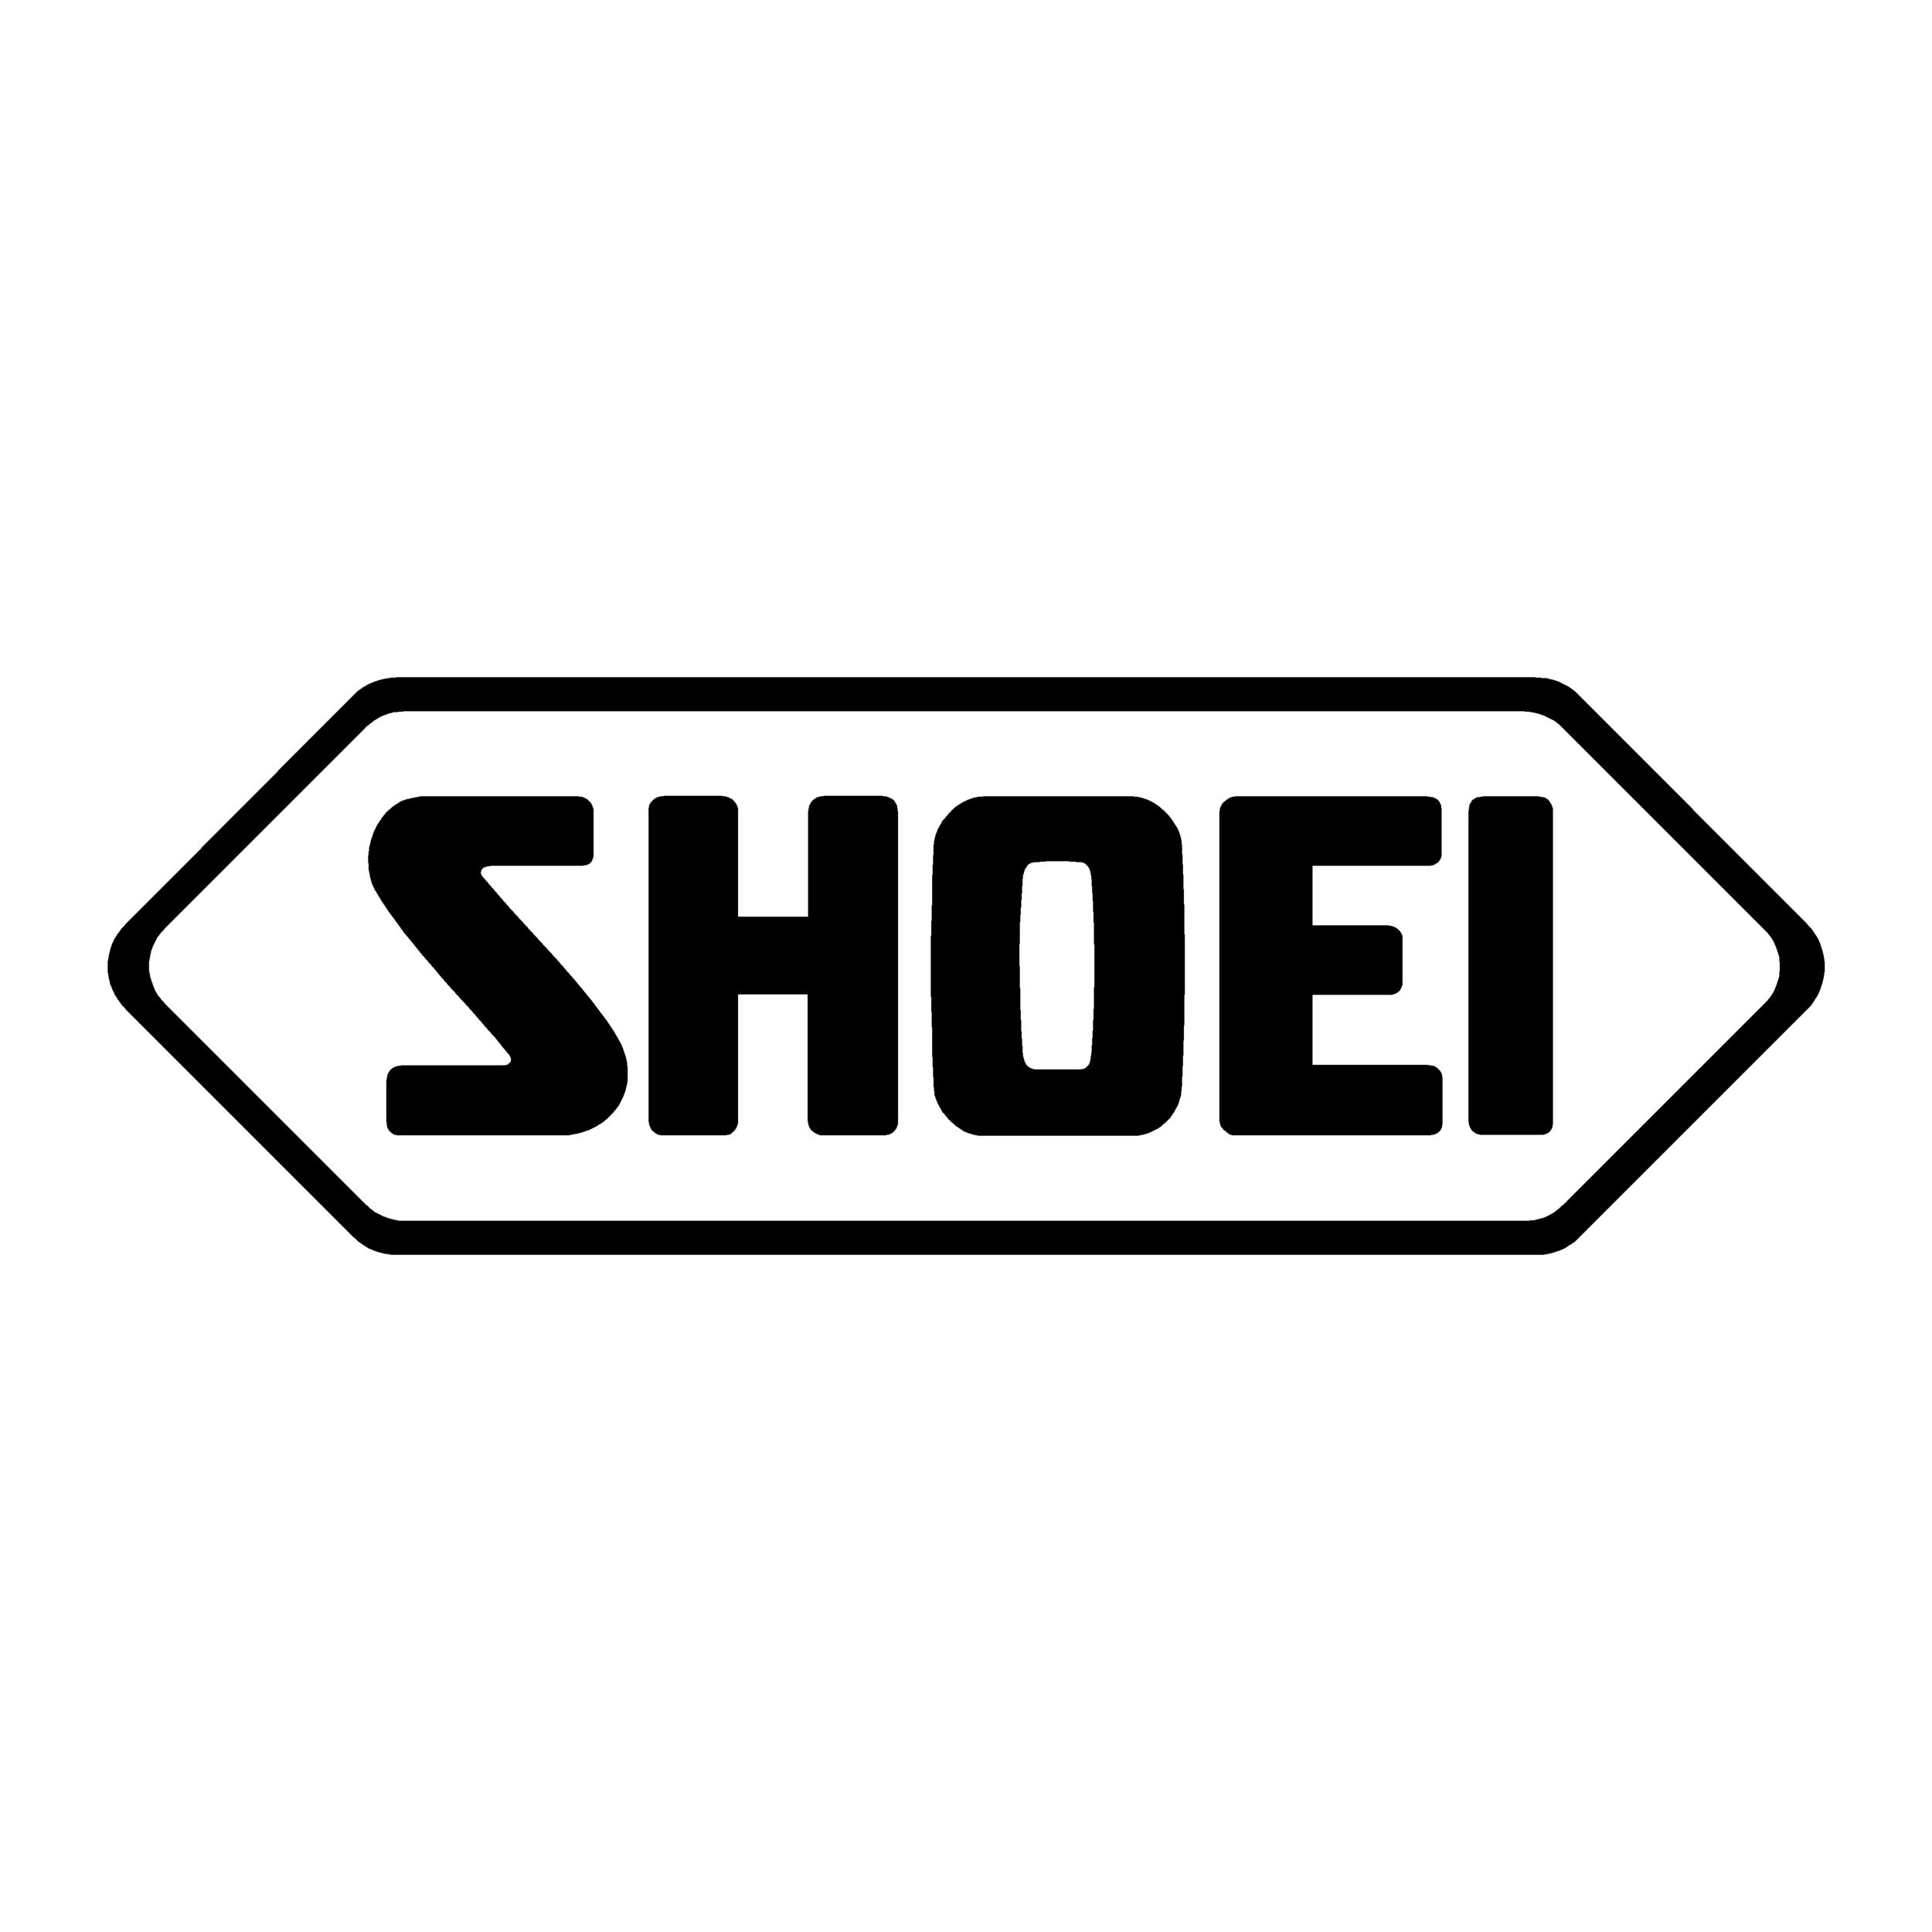 stickers shoei ref 1 tuning audio sonorisation car auto moto camion competition deco rallye autocollant